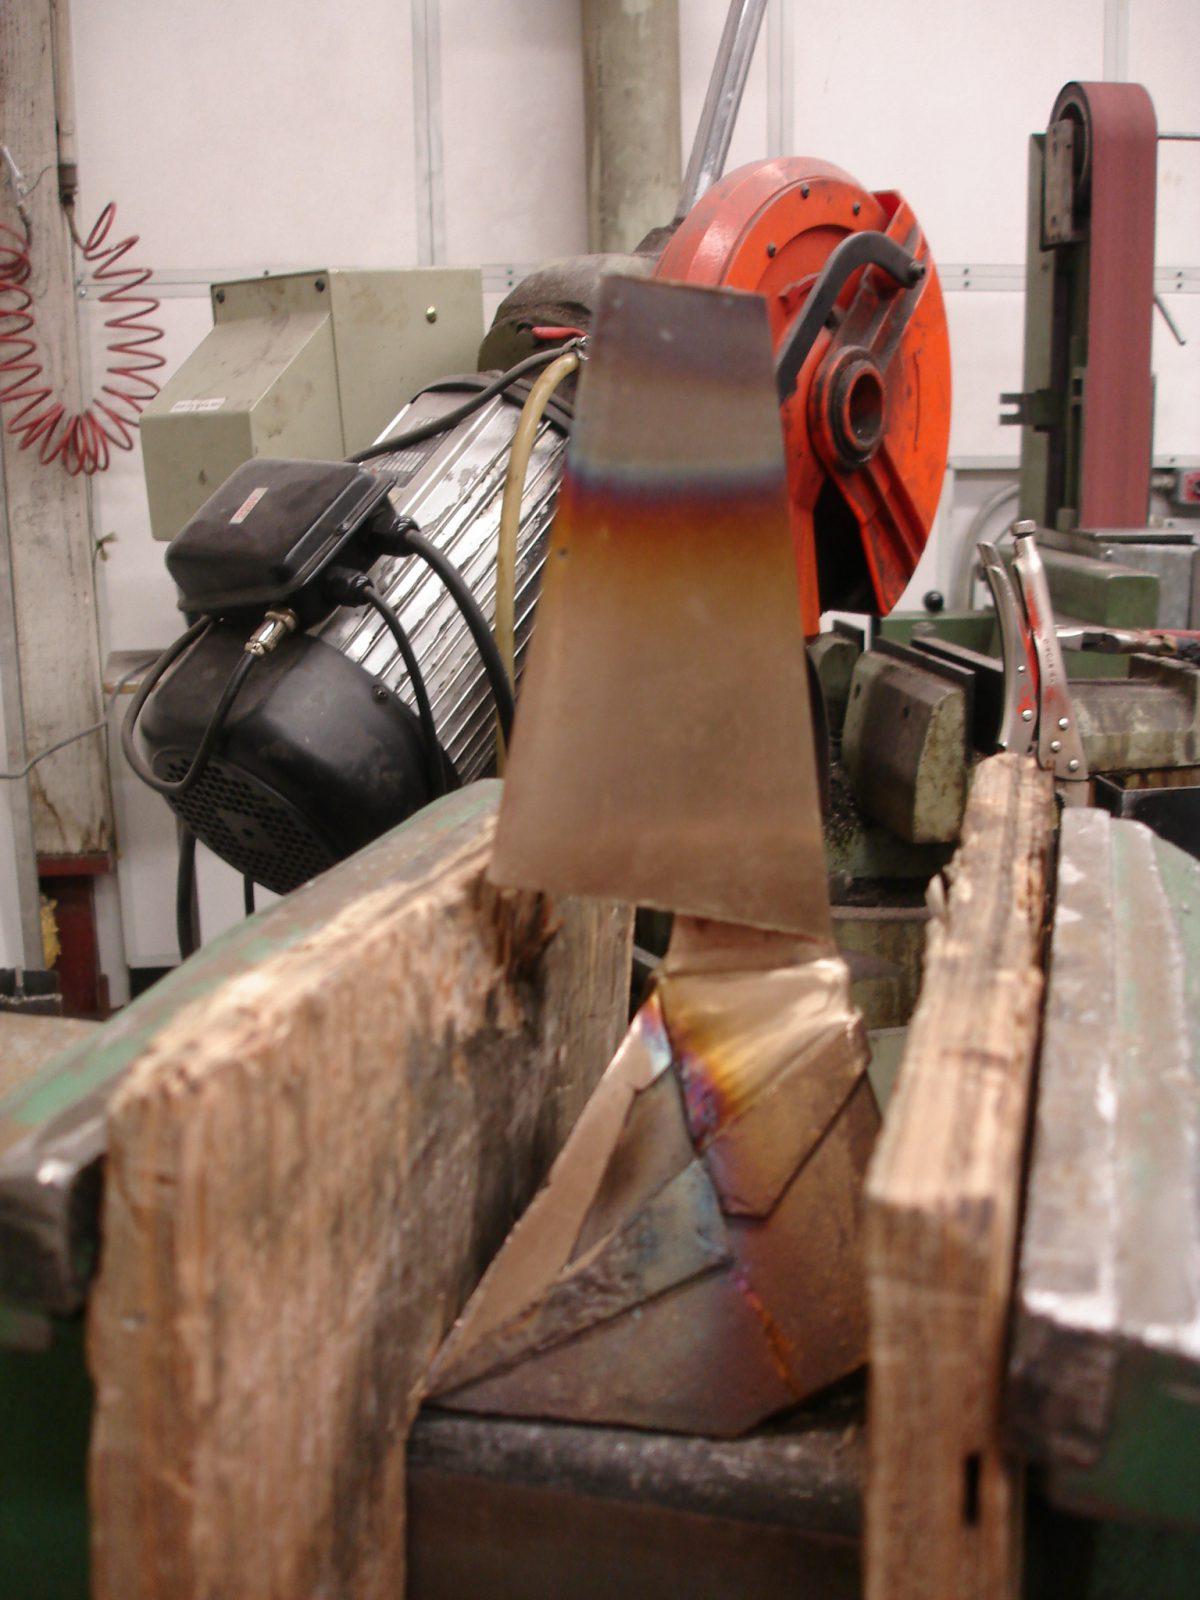 Divider - wip - Grind, ch3, sculpture, process, bronze